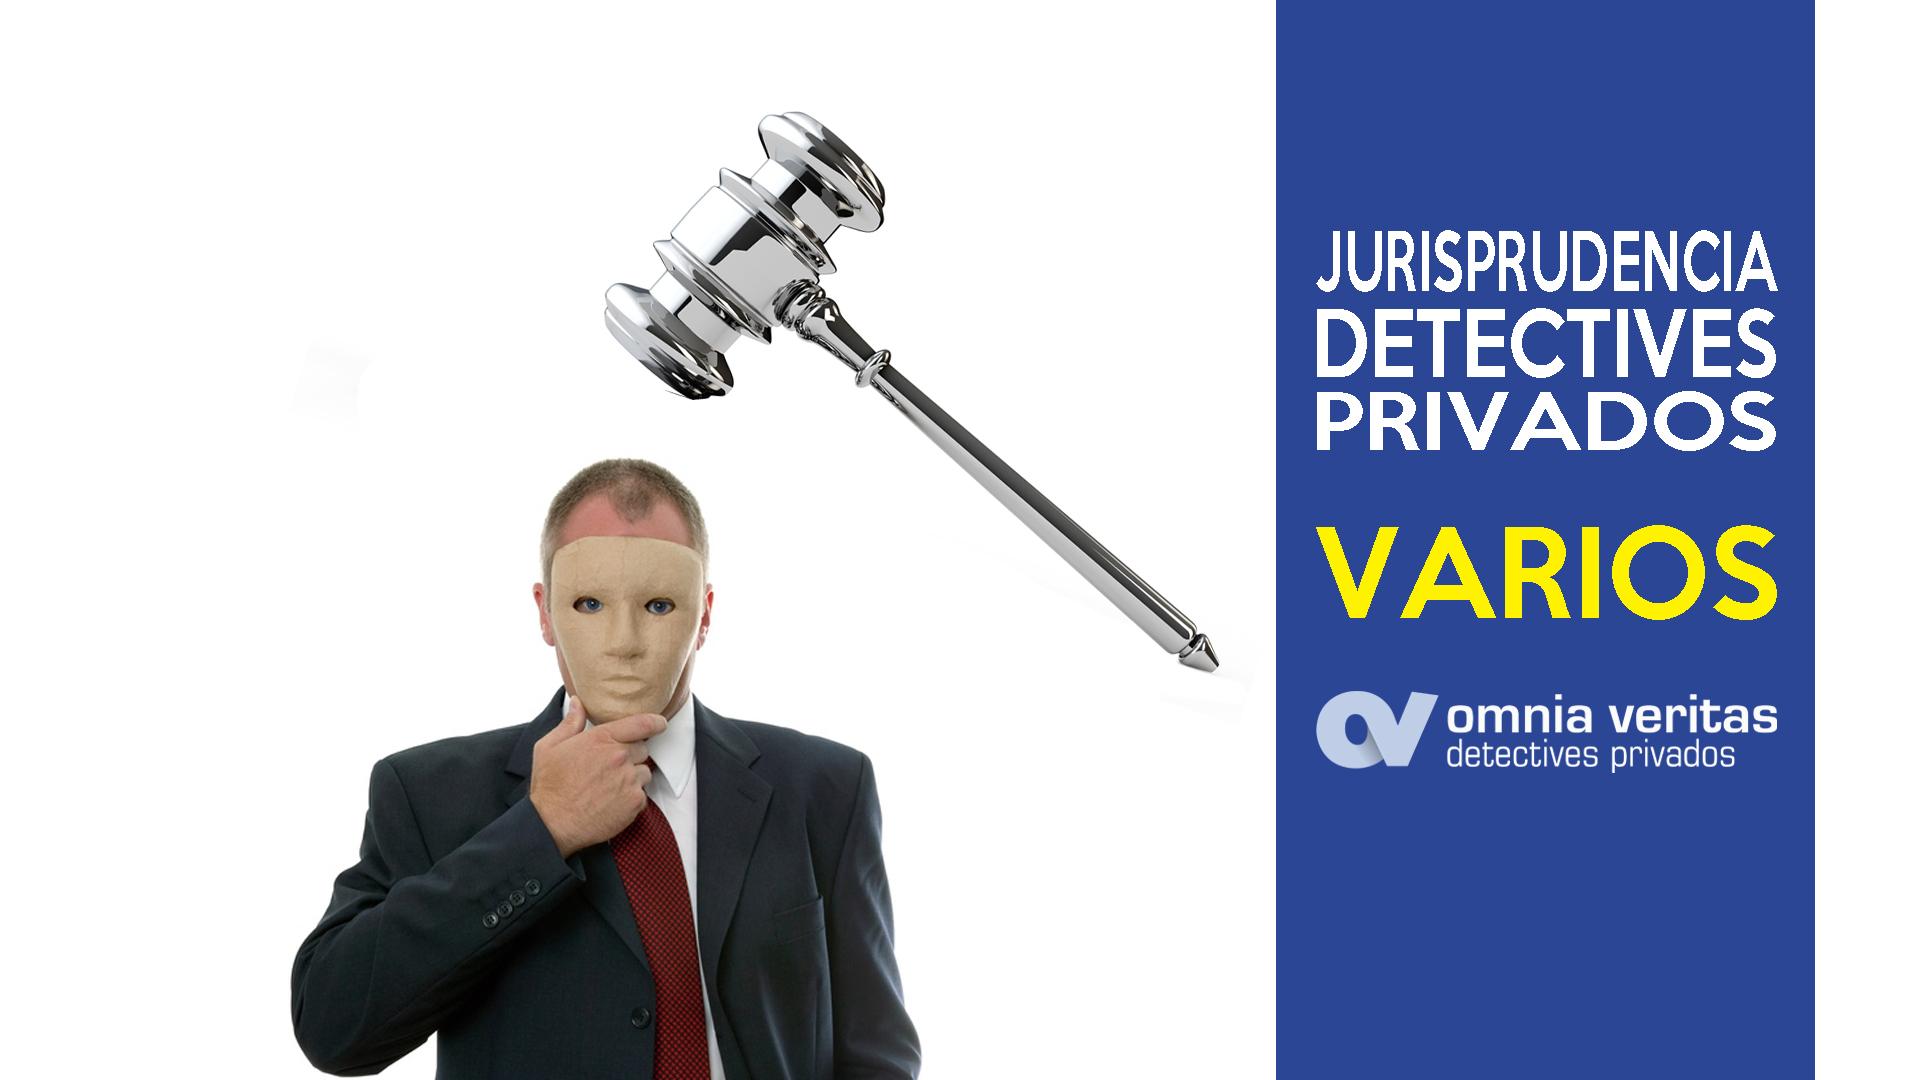 JURISPRUDENCIA VARIADA DETECTIVES